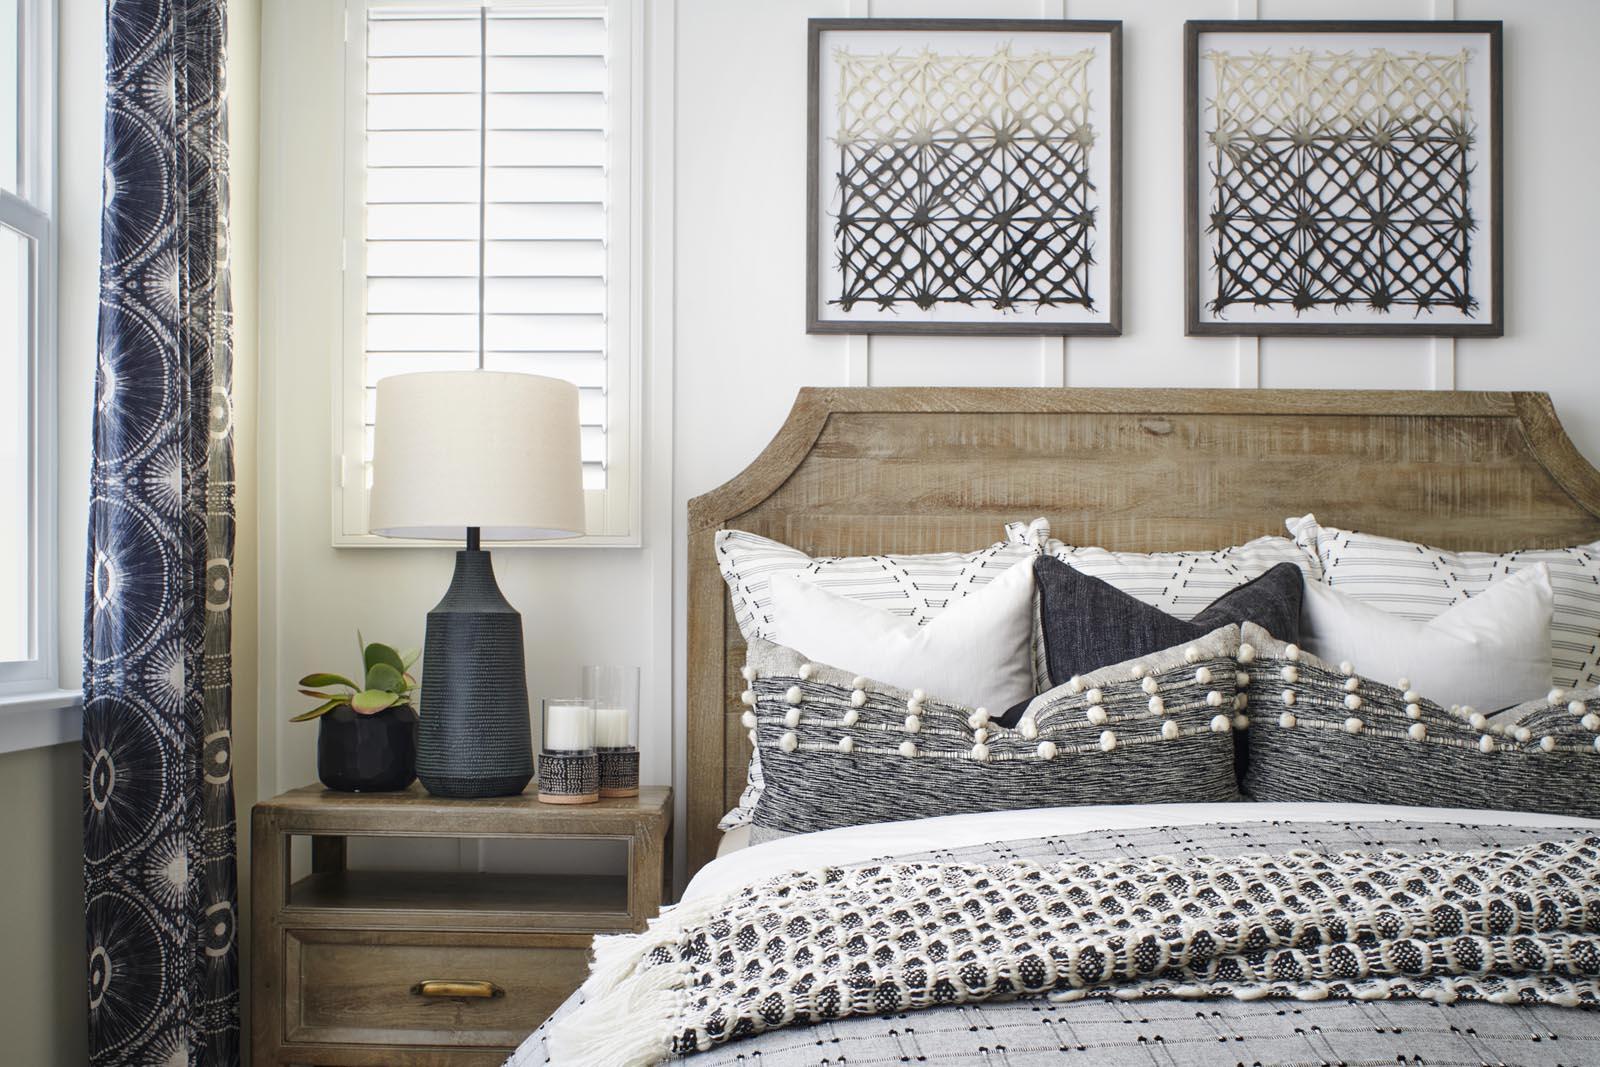 Master Bedroom | Residence 2 | Enliven | New Homes in Rancho Cucamonga, CA | Van Daele Homes